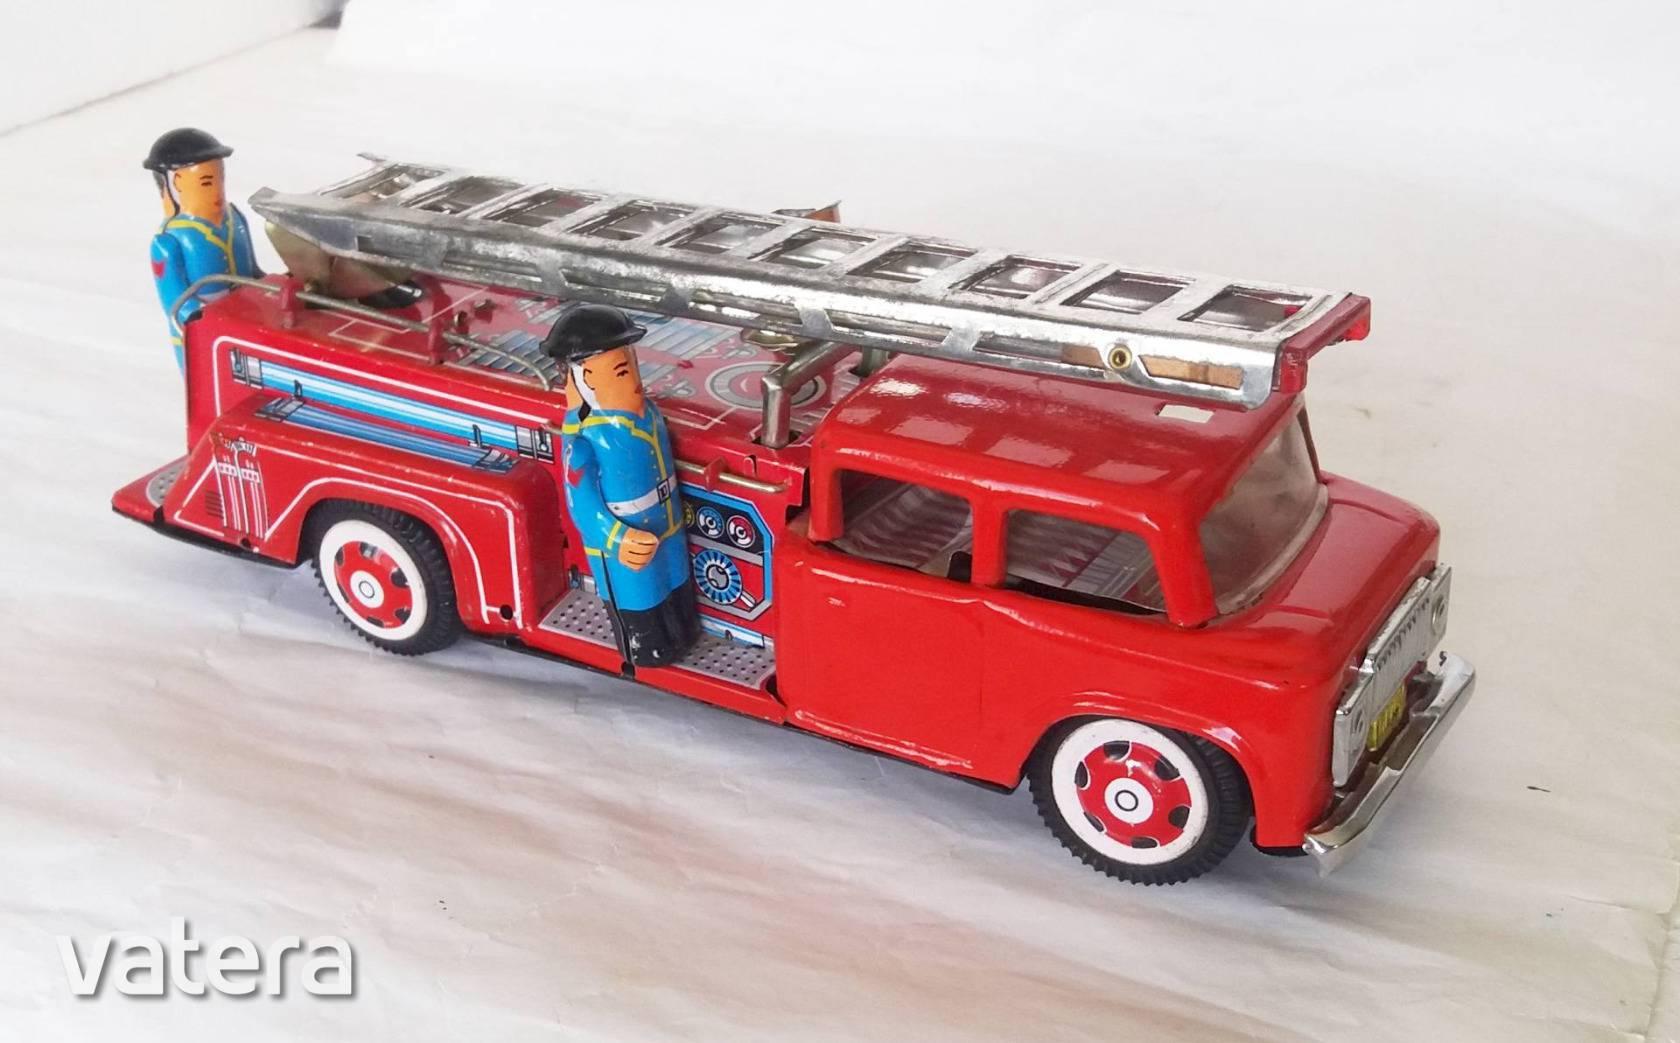 lendkerekes-tuzoltoauto-kinai-badog-lemez-retro-jatek-regiseg-b0aa_1_big_1.jpg